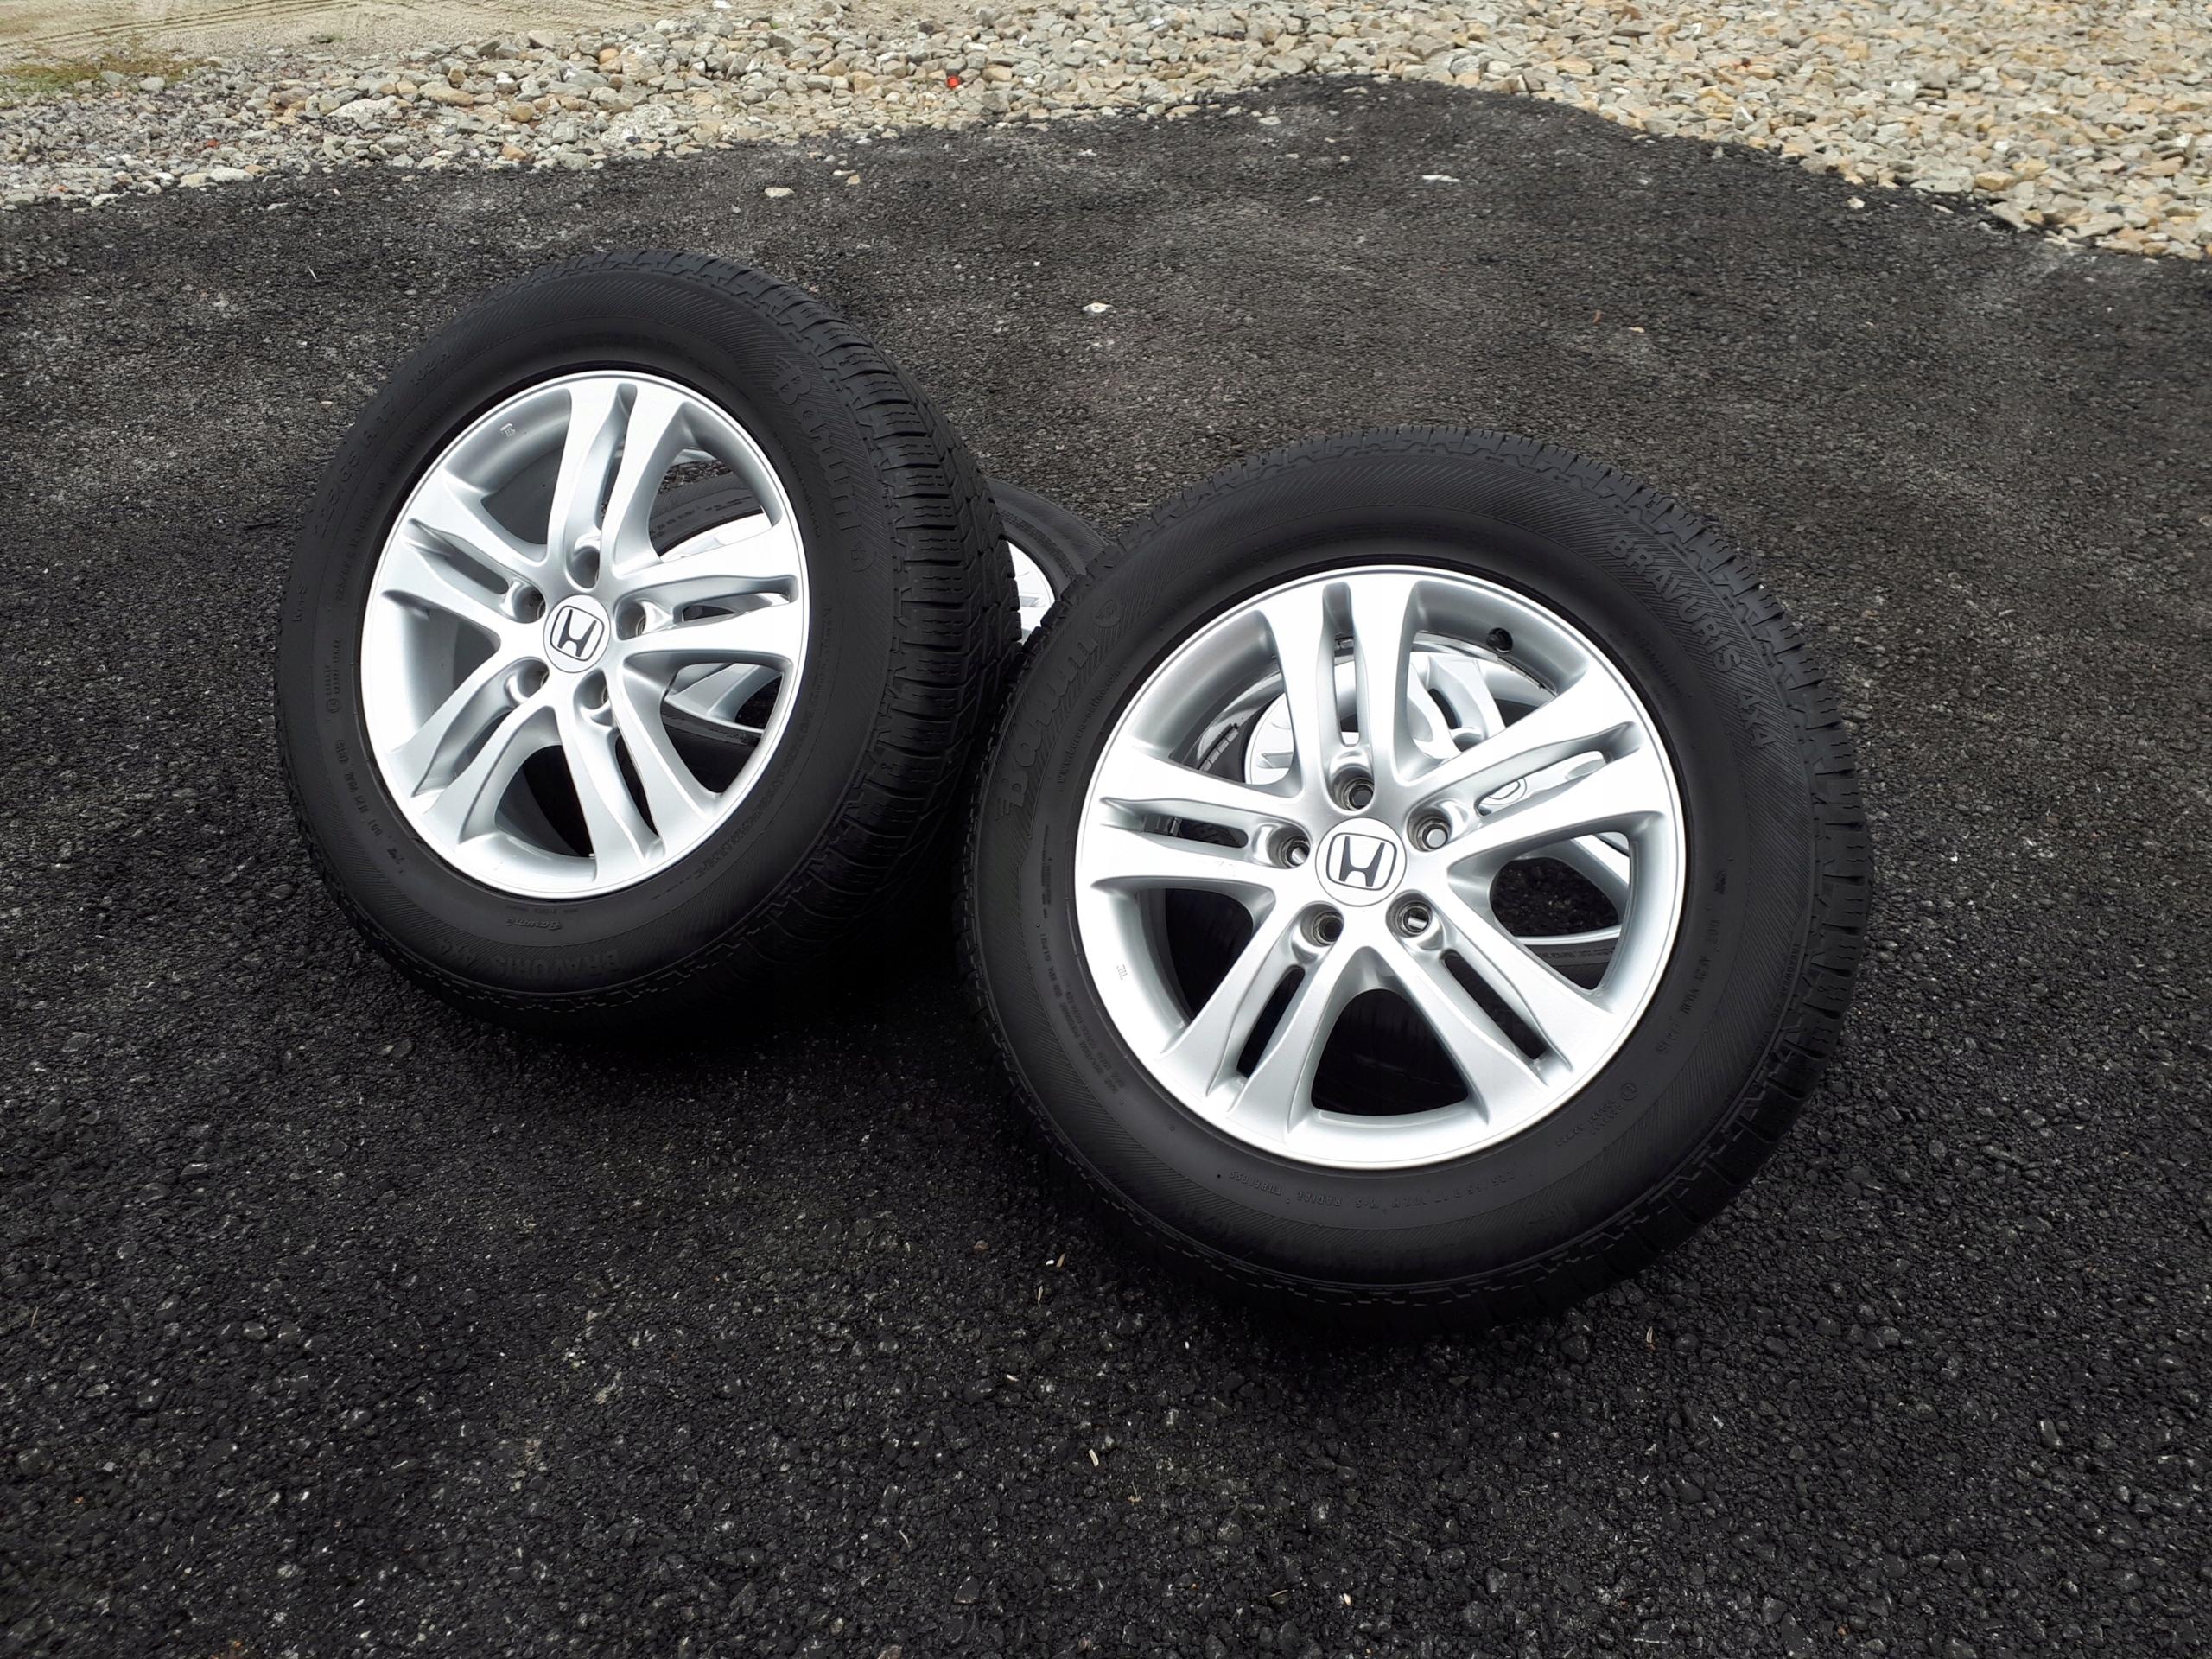 Honda Crv Cr V 5x1143 22565r17 Nowy Model 7578195947